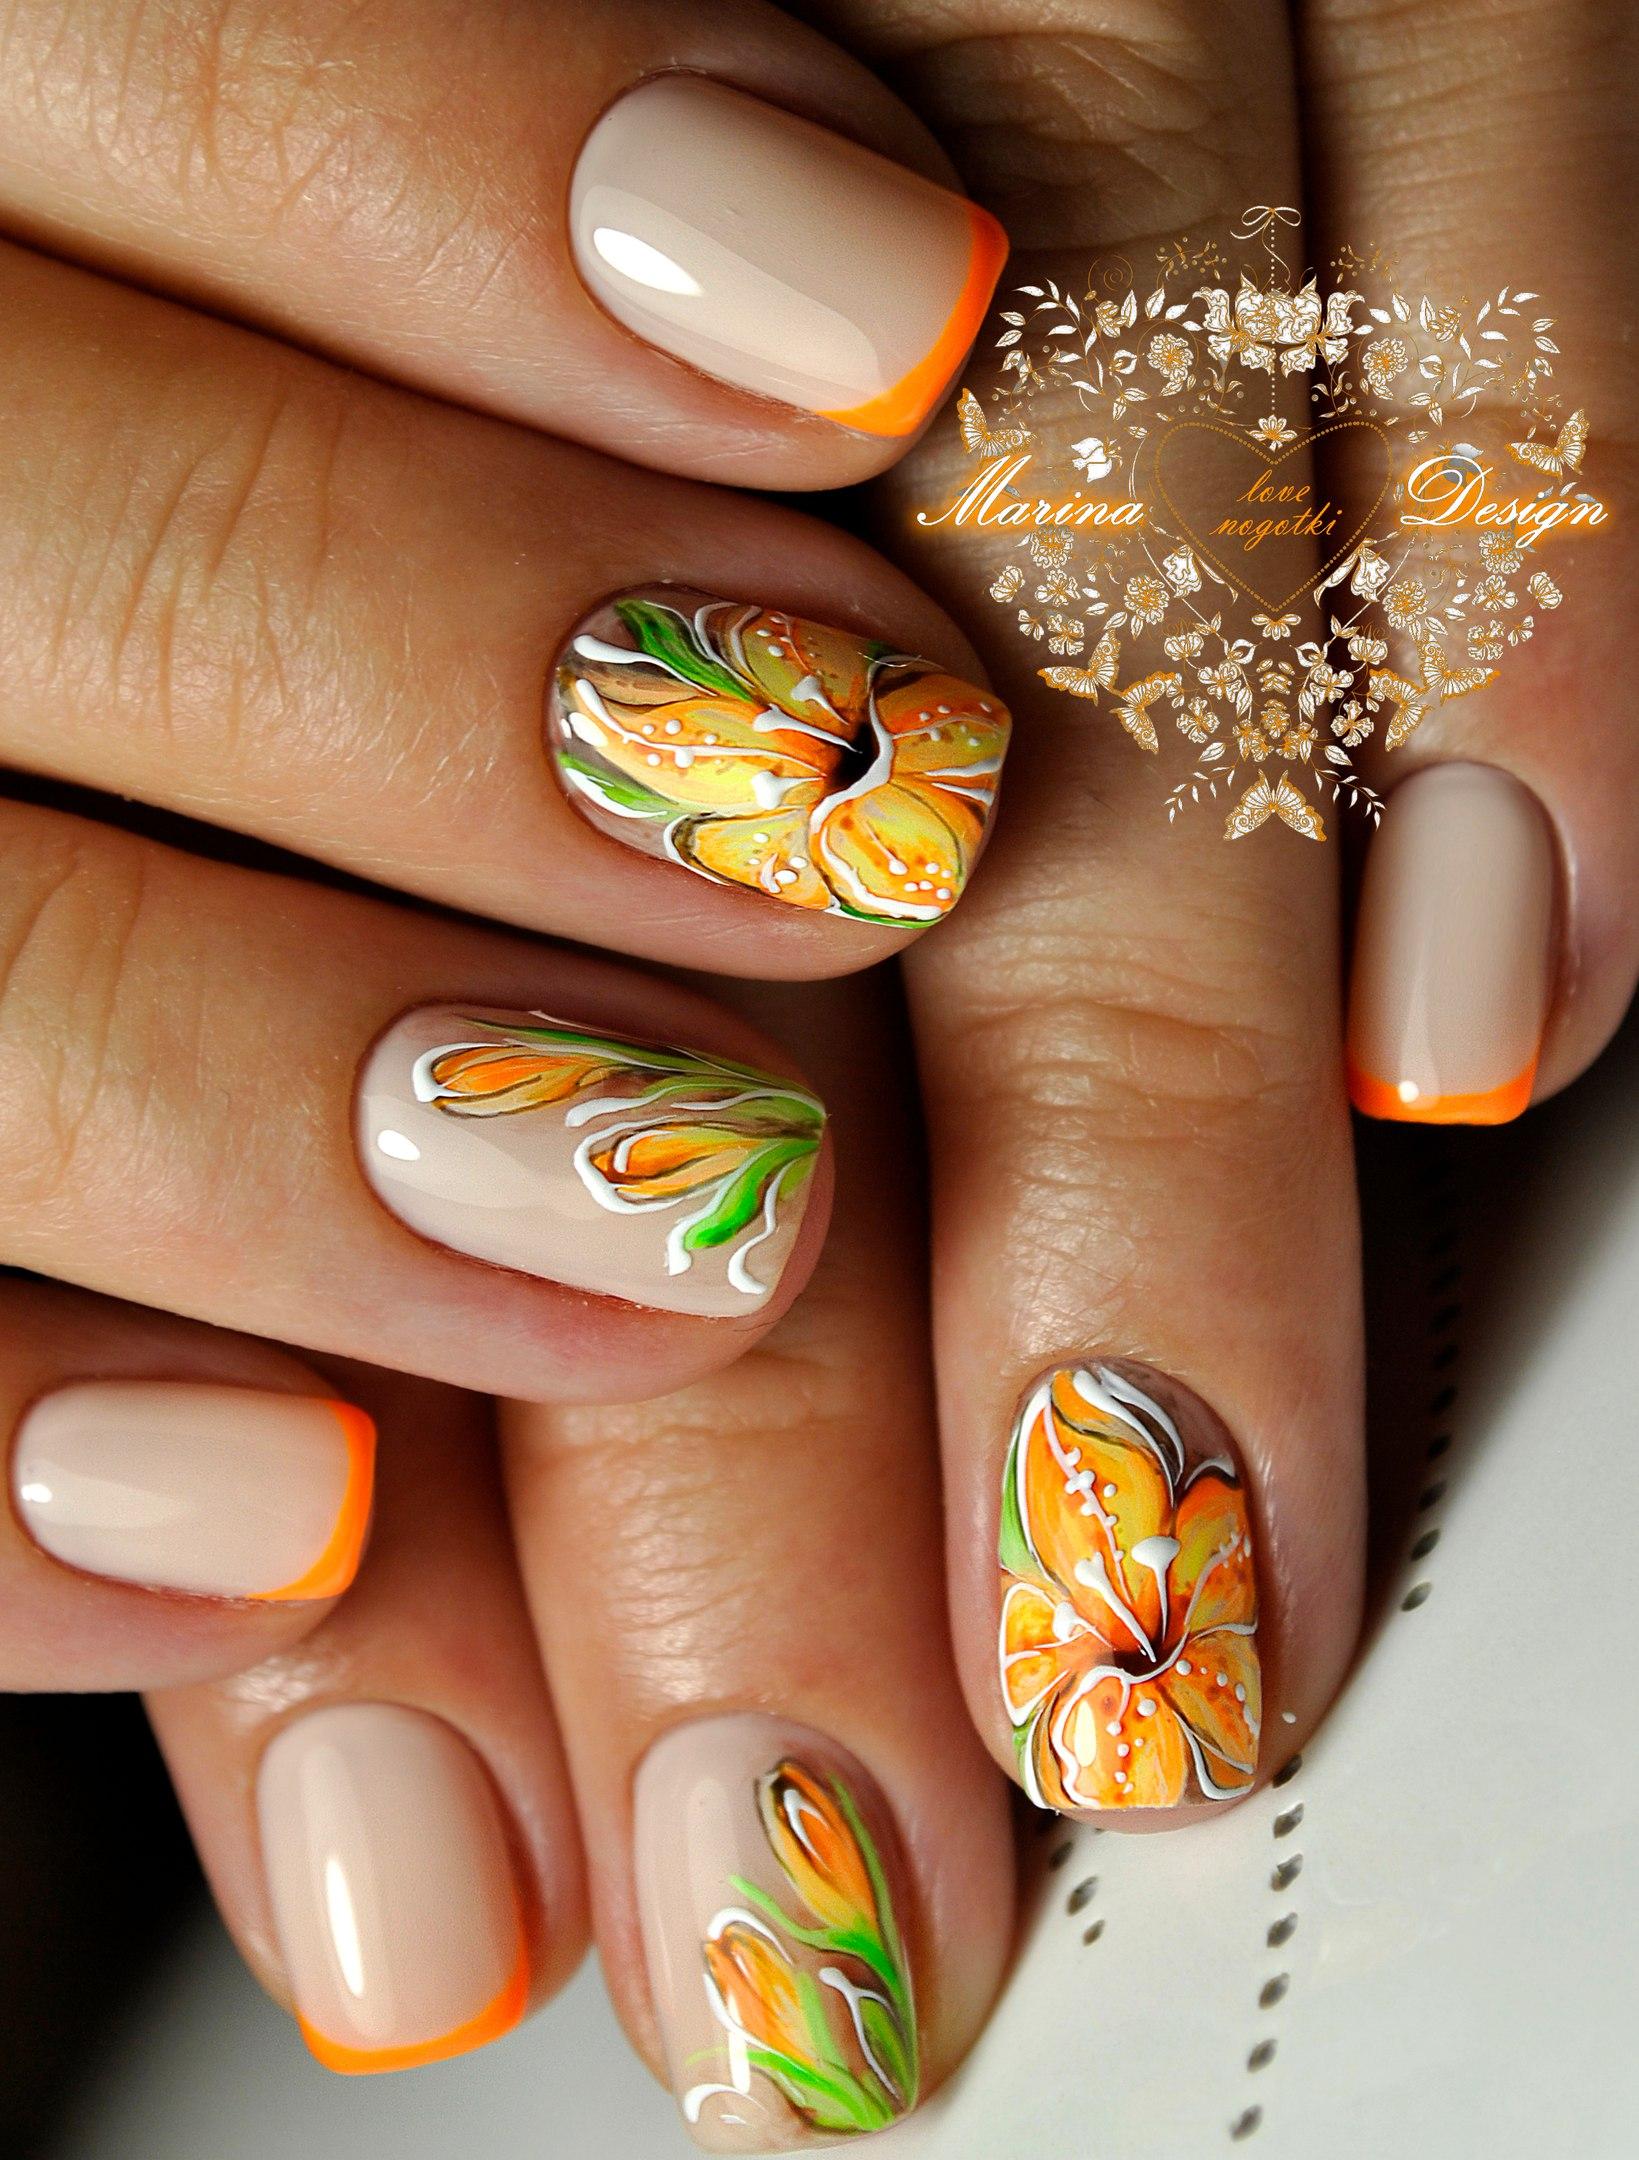 Дизайн ногтей френч со слайдерами фото